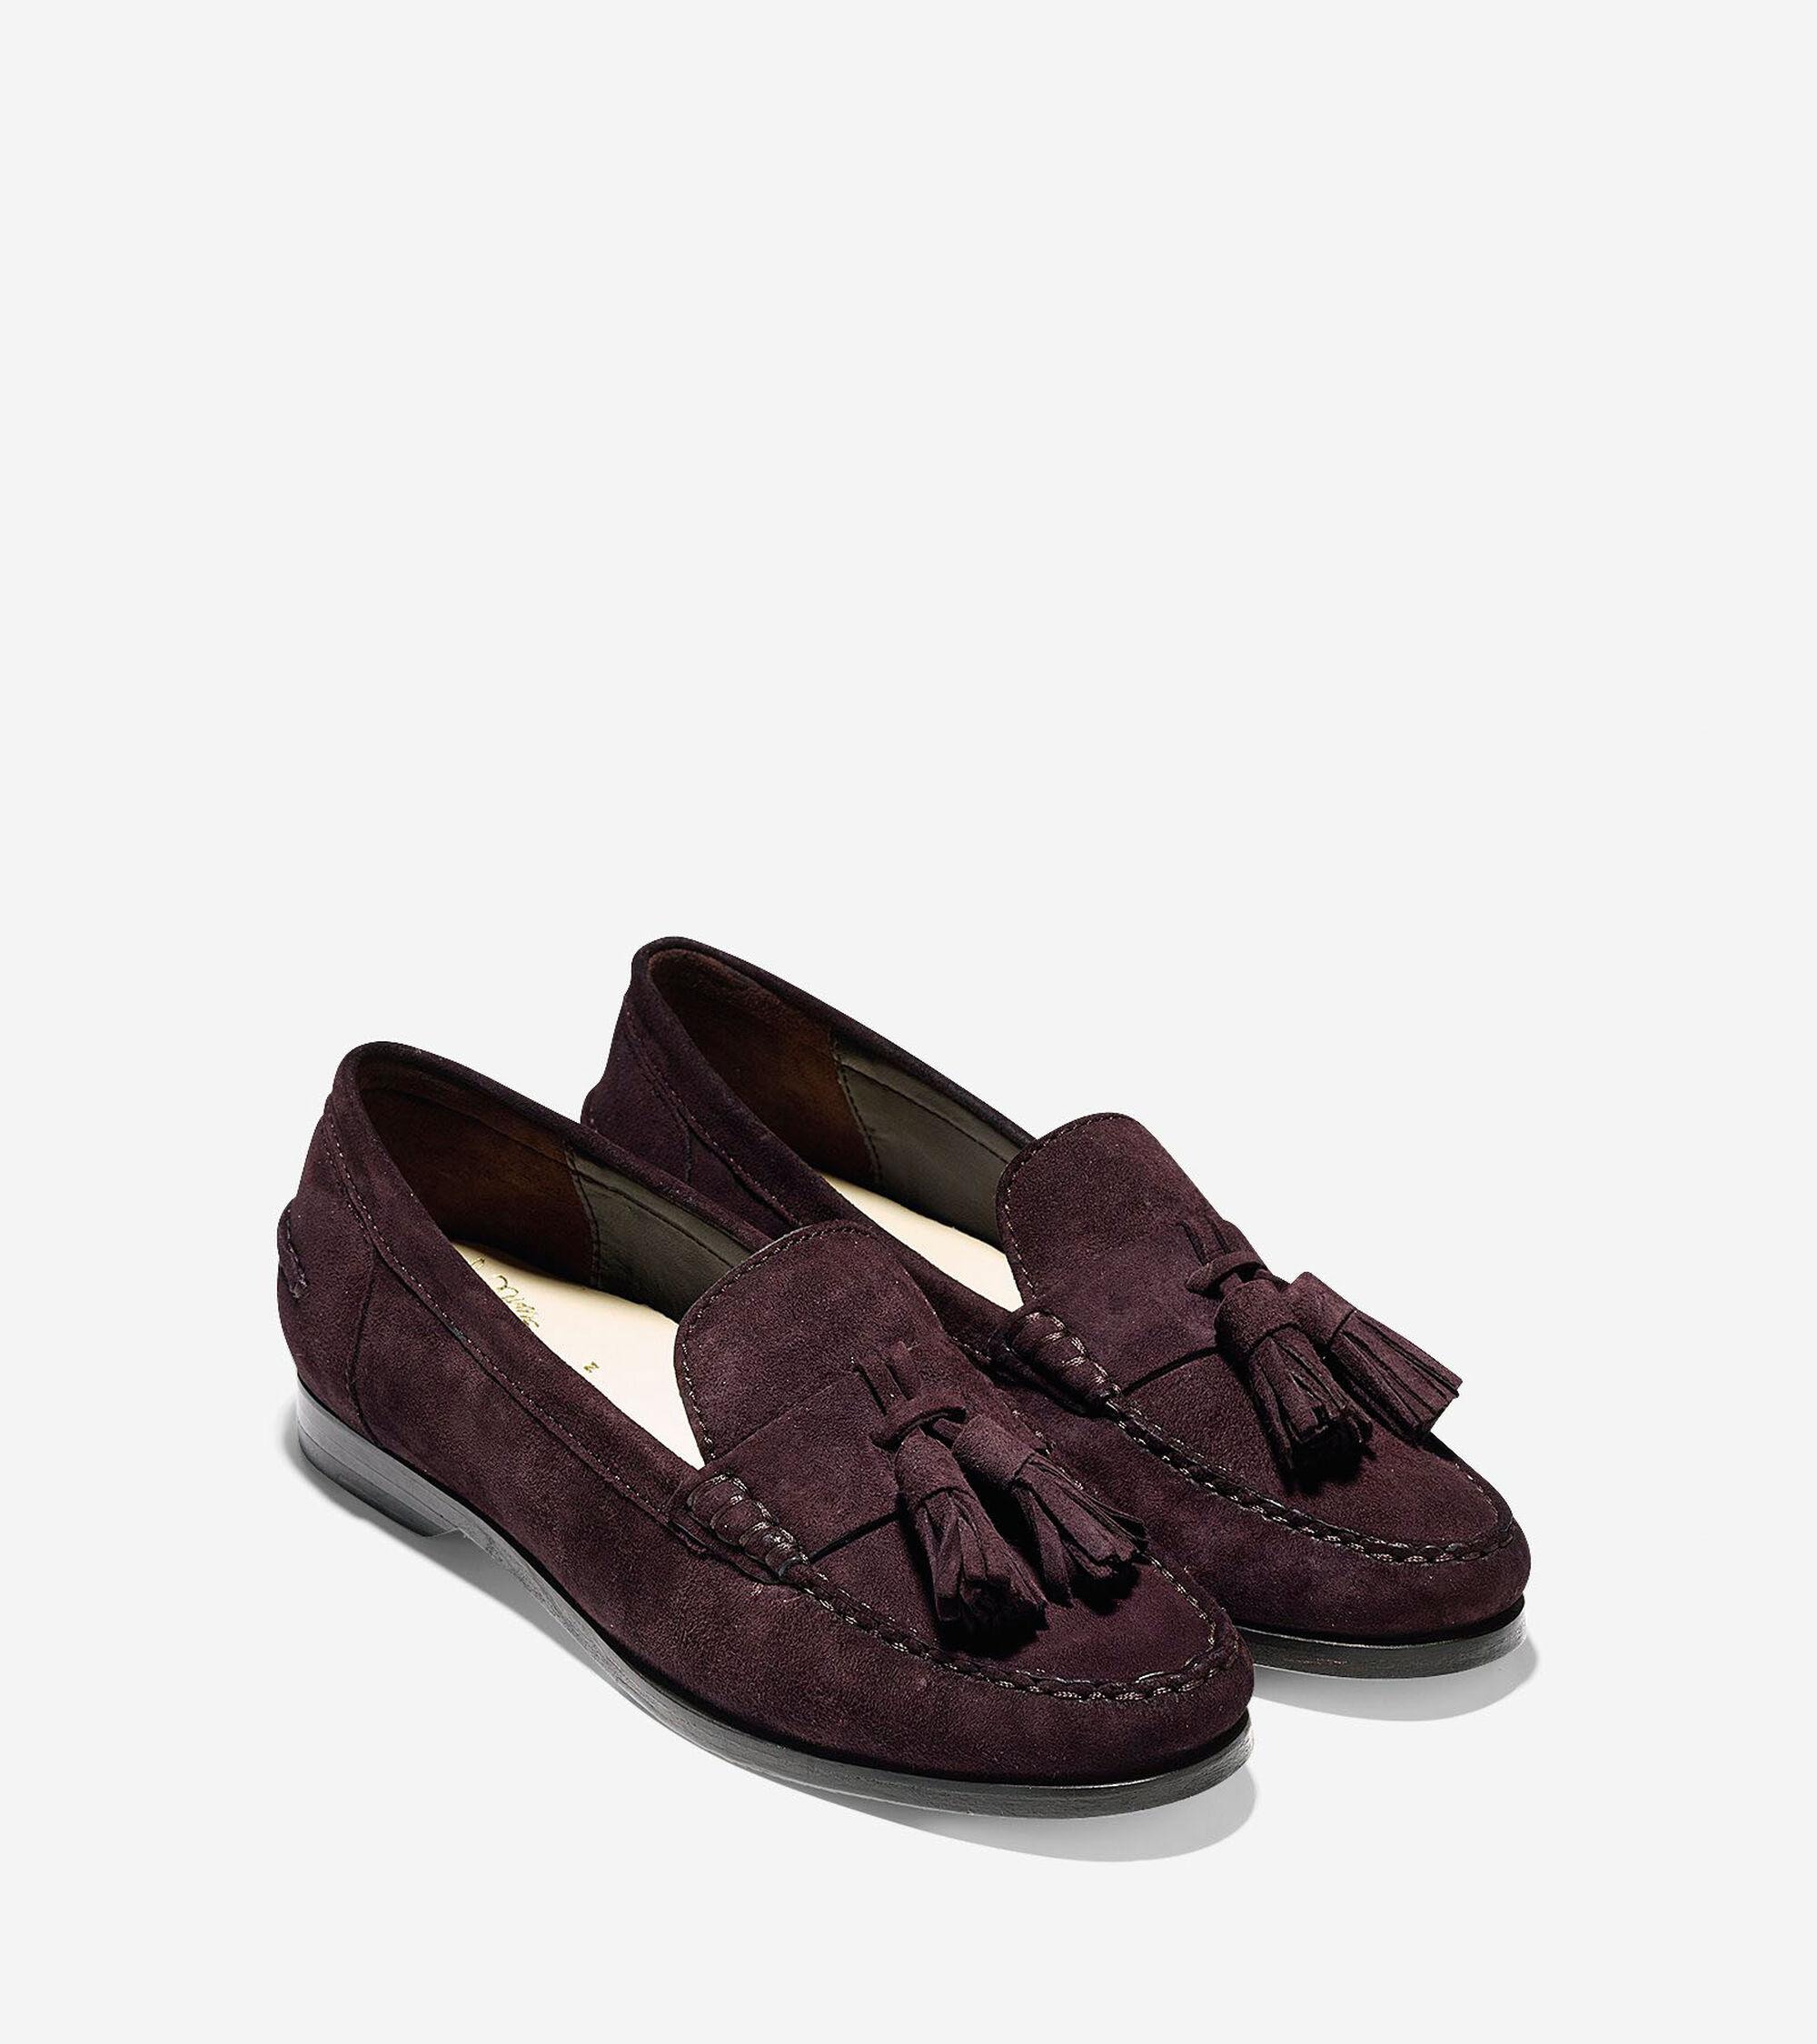 d8120534b35 Pinch Grand Tassel Loafers in Chestnut Suede